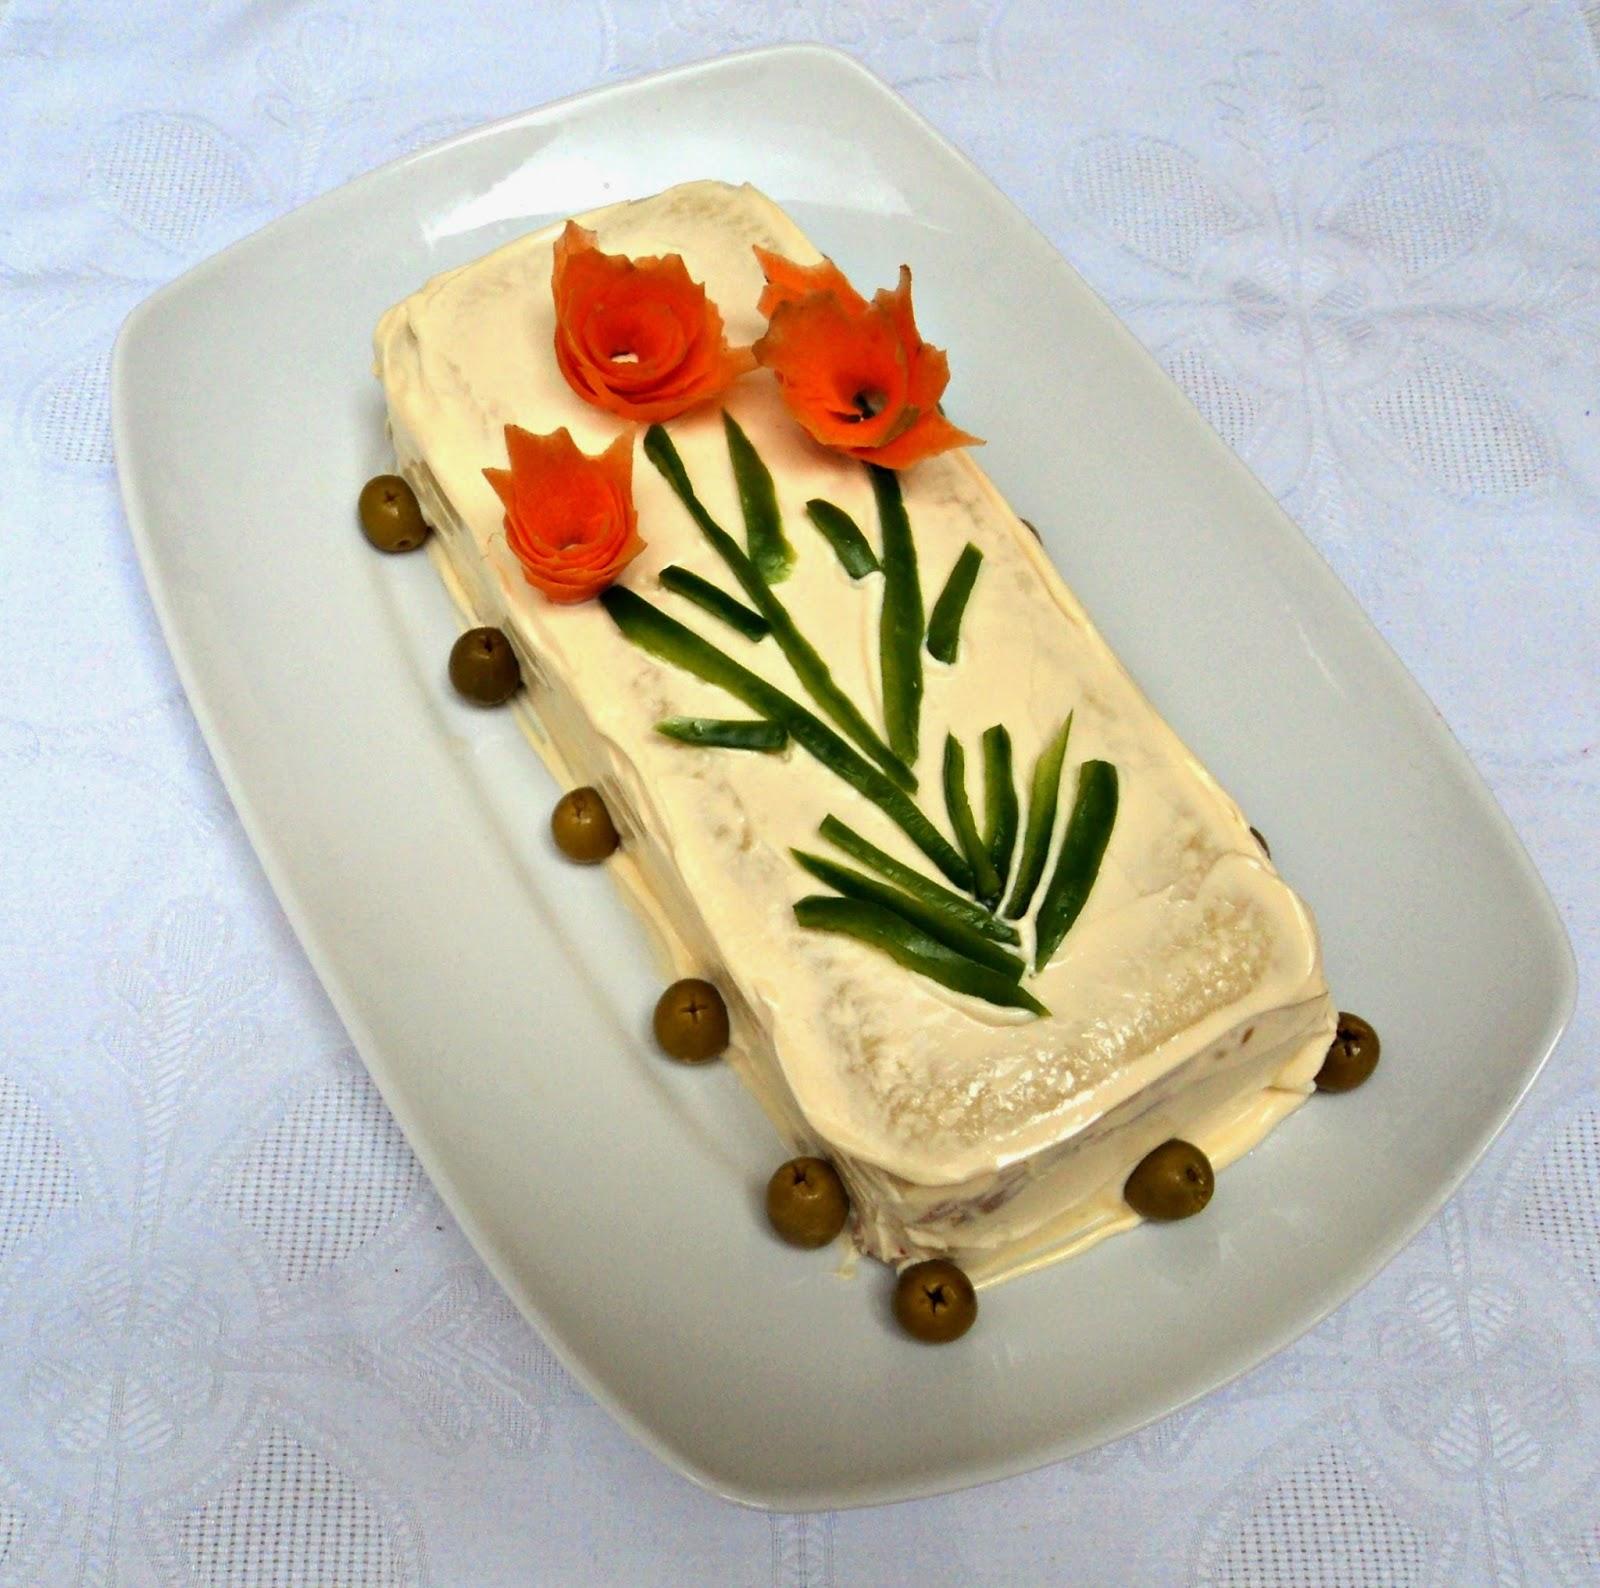 receta casera de pastel frío pan molde con cangrejo